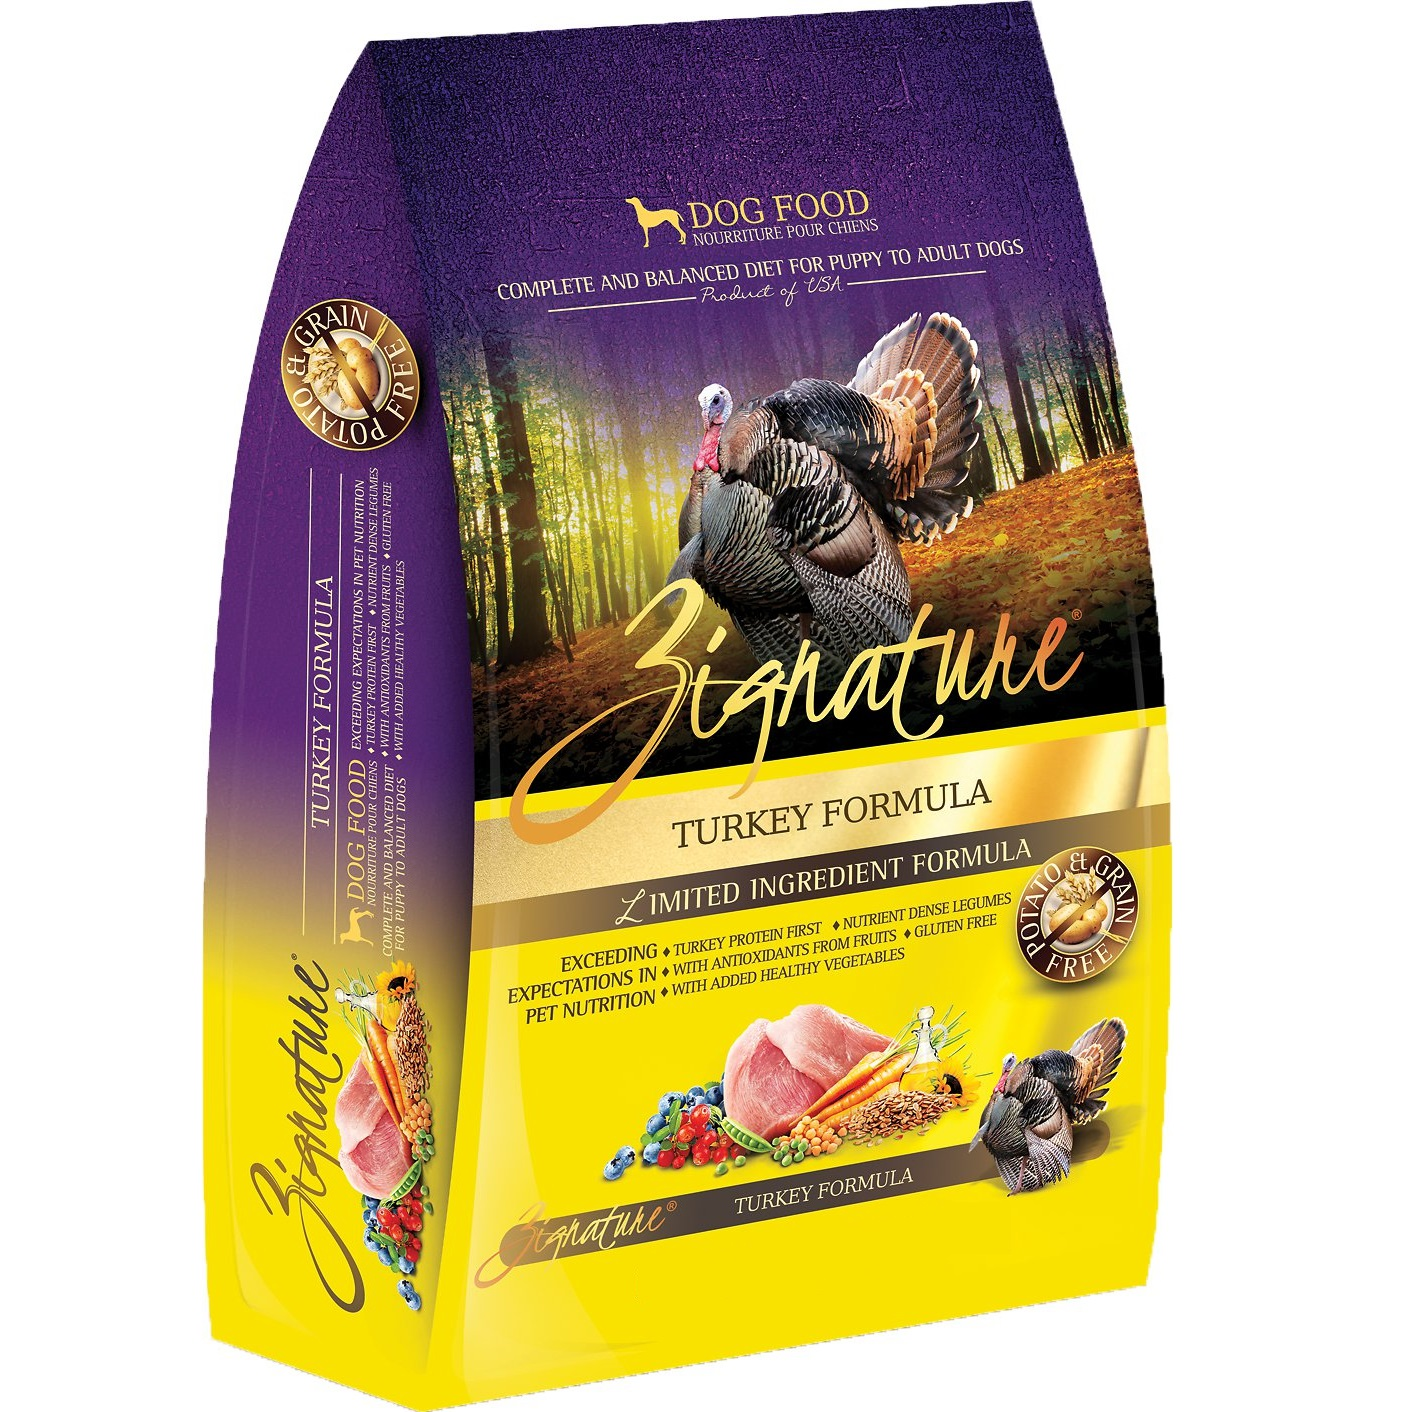 Zignature Grain-Free Turkey Limited Ingredient Formula Dry Dog Food 13.5lbs